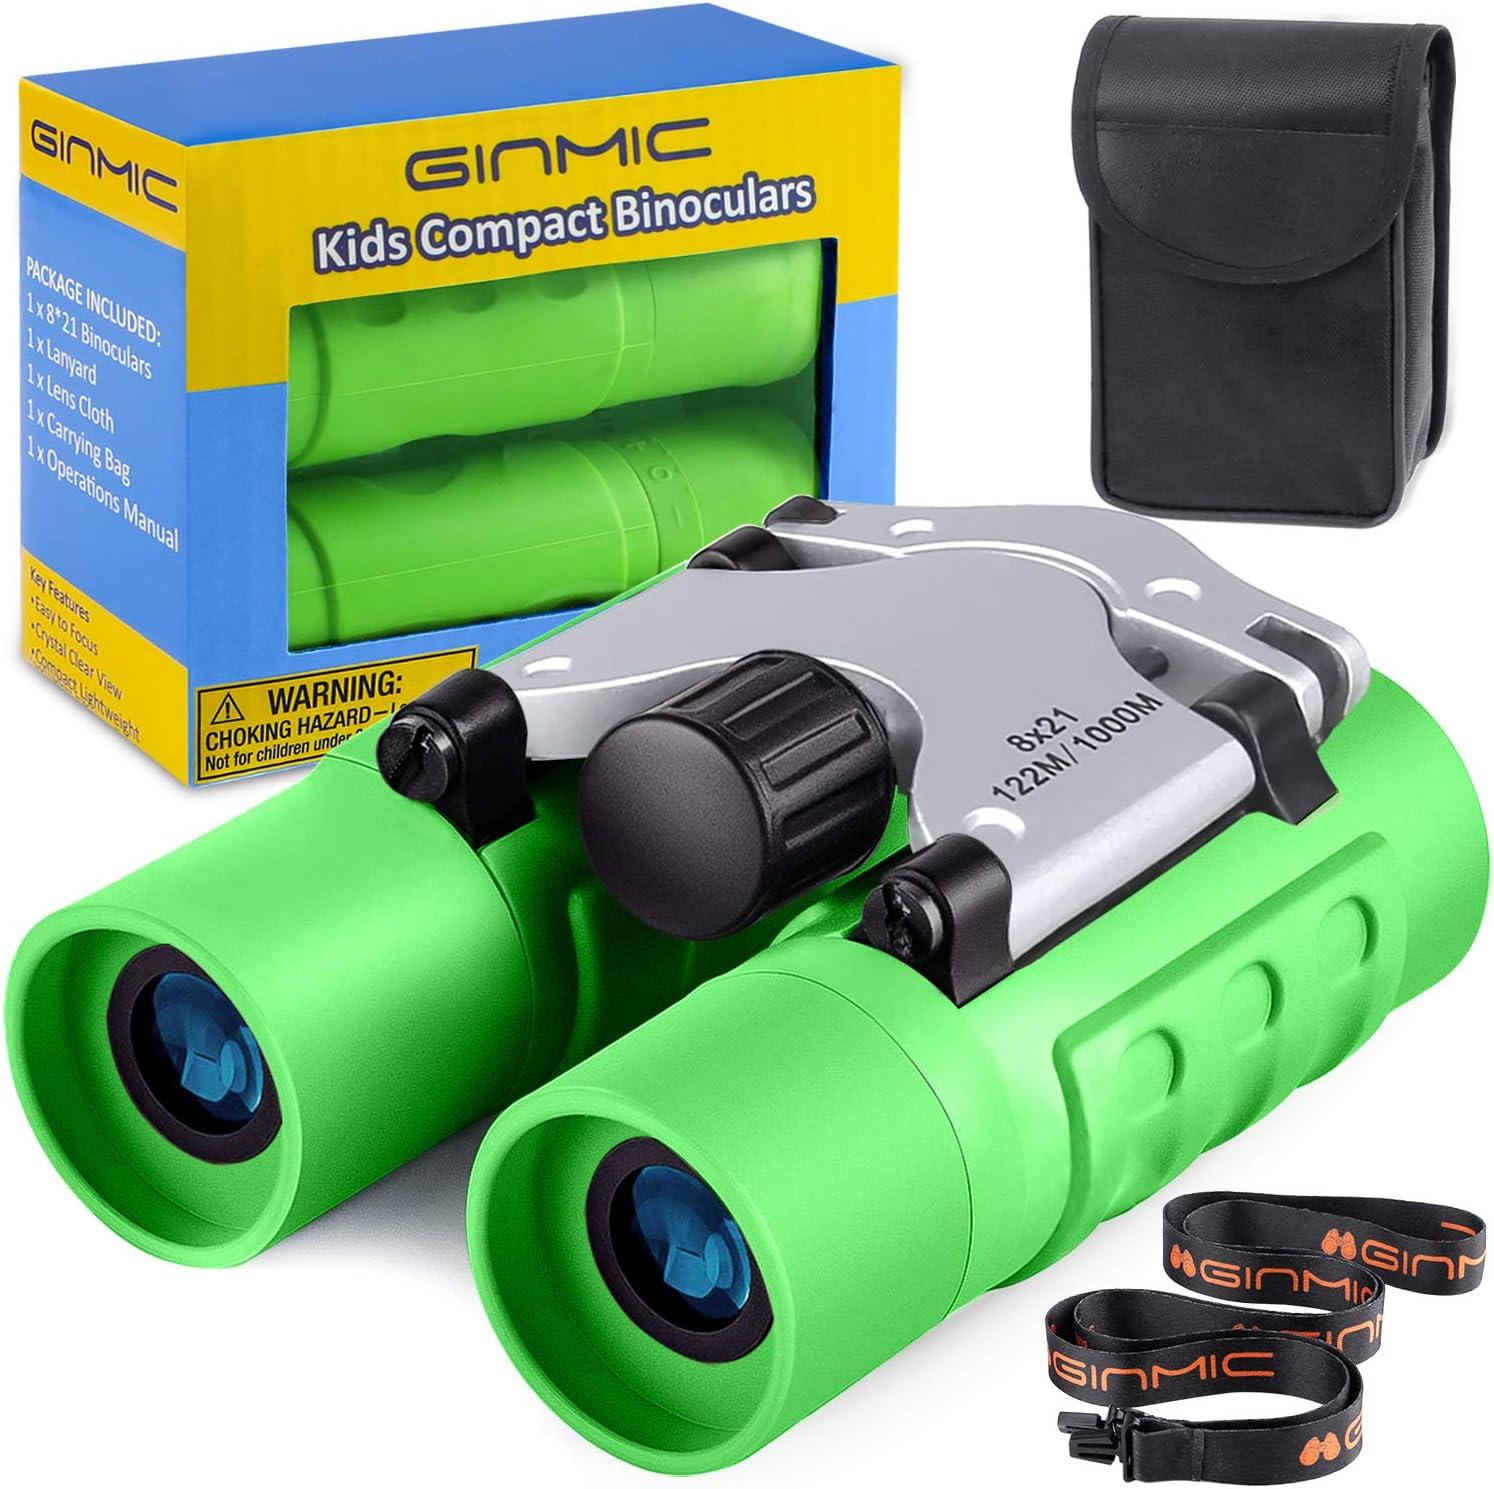 Binoculars for Kids 8 Outlet SALE x 21 5% OFF Compact Real Optics Mini Binocu